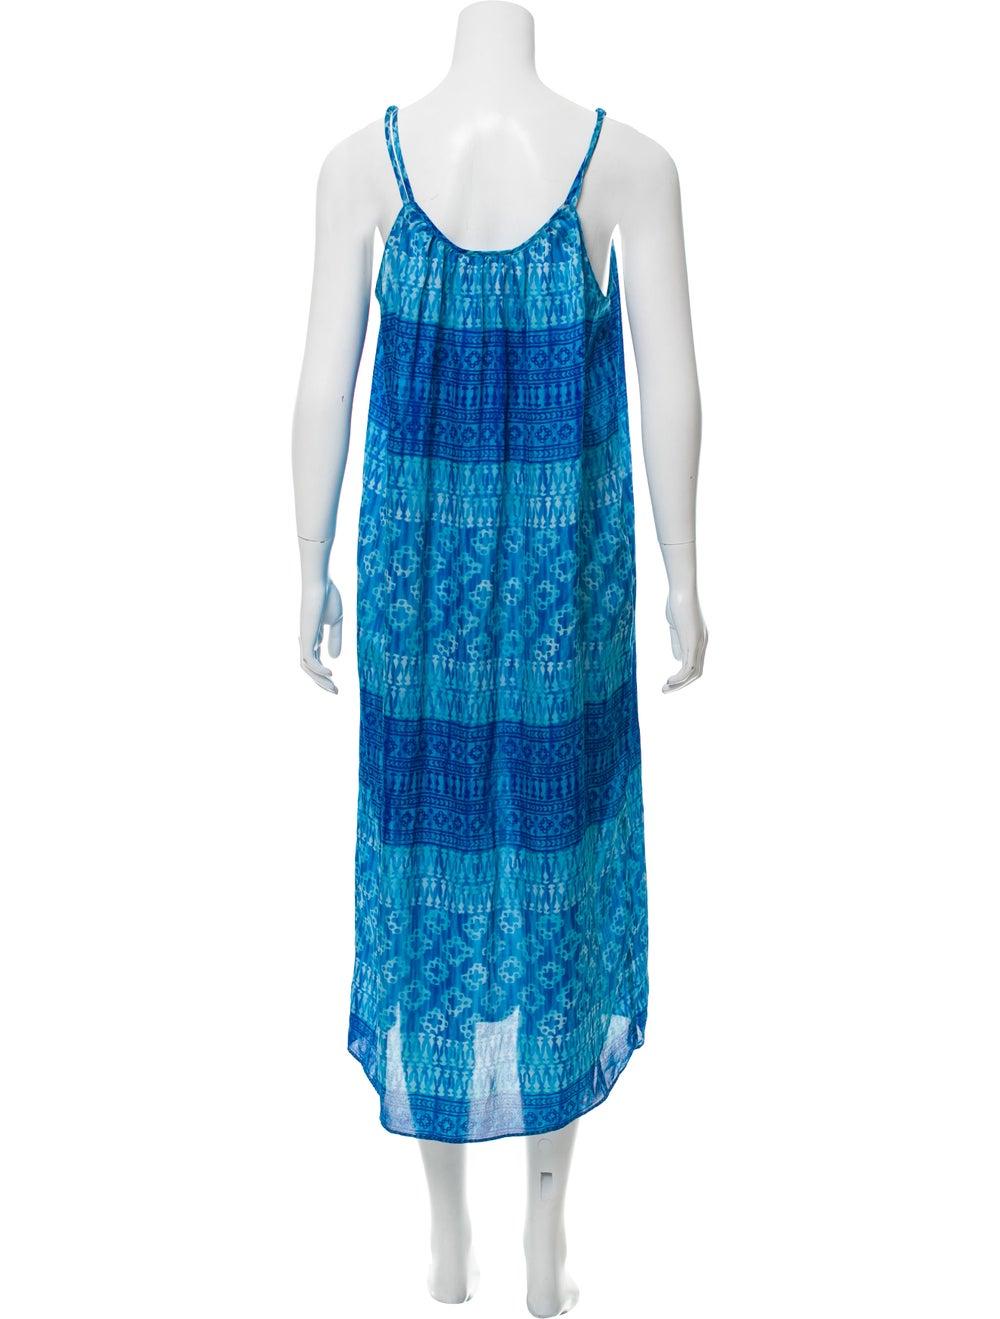 Oscar de la Renta Sleeveless Maxi Dress Blue - image 3